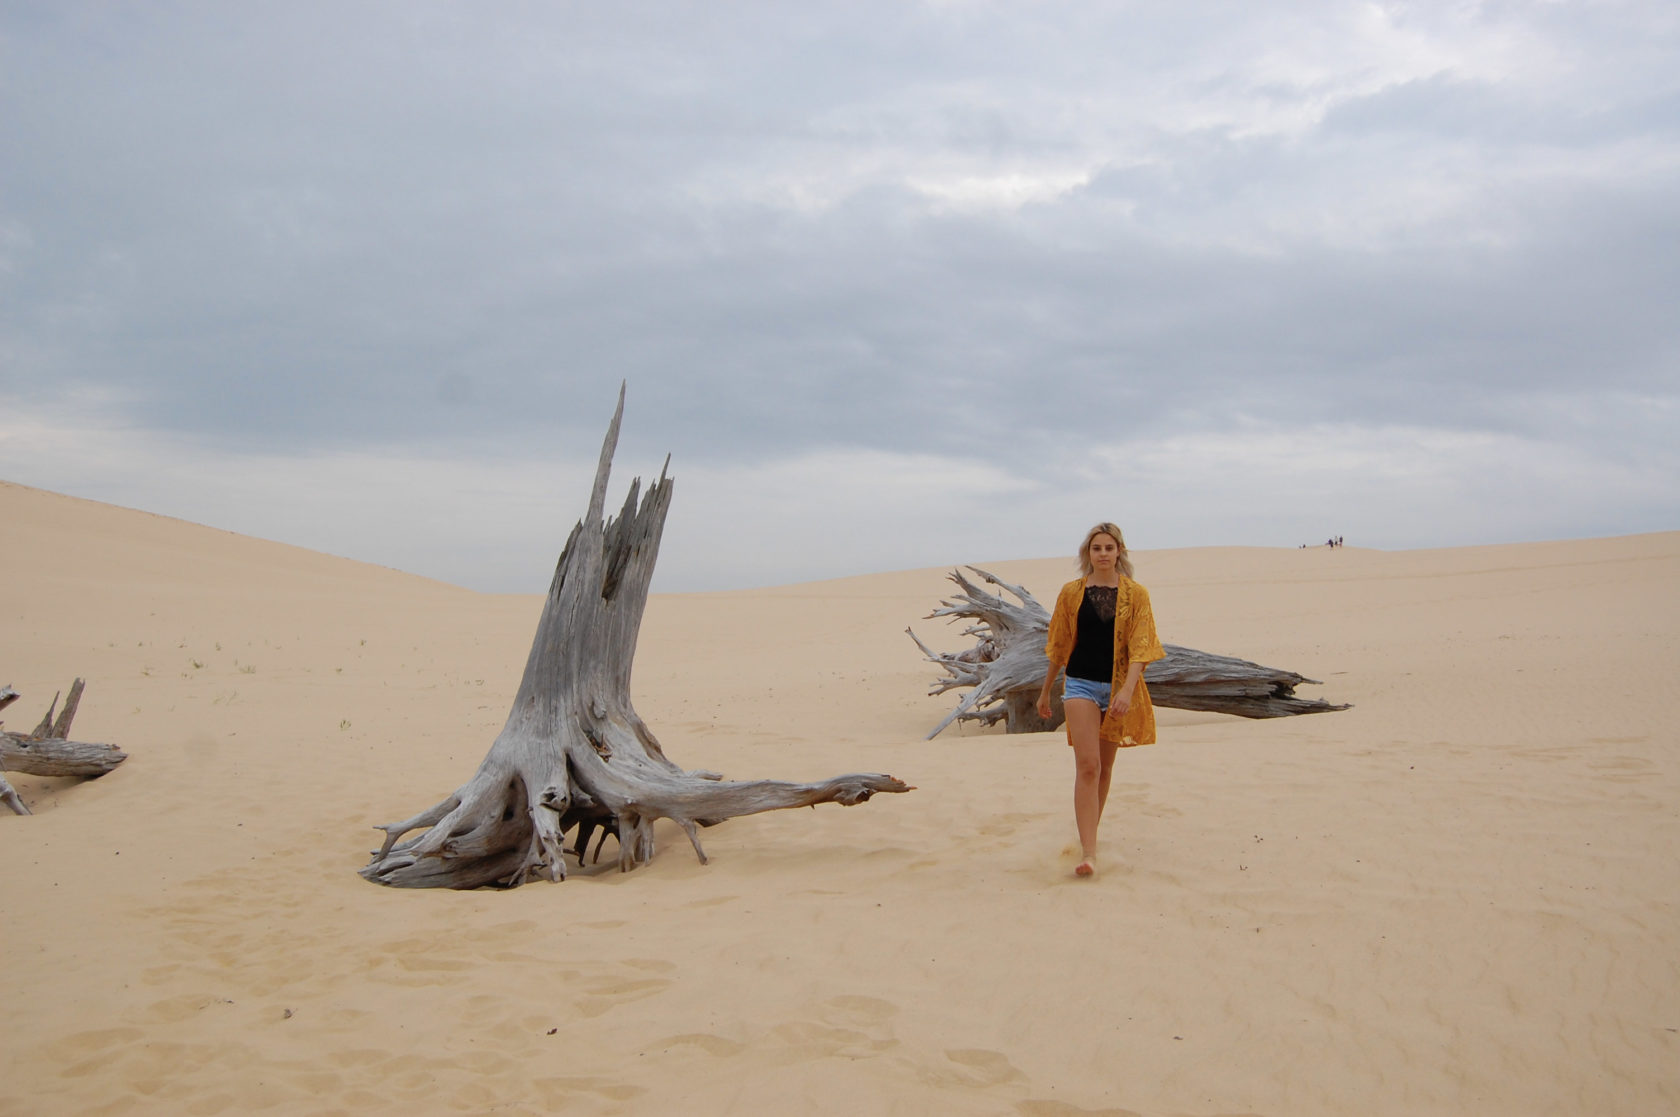 sand dunes style